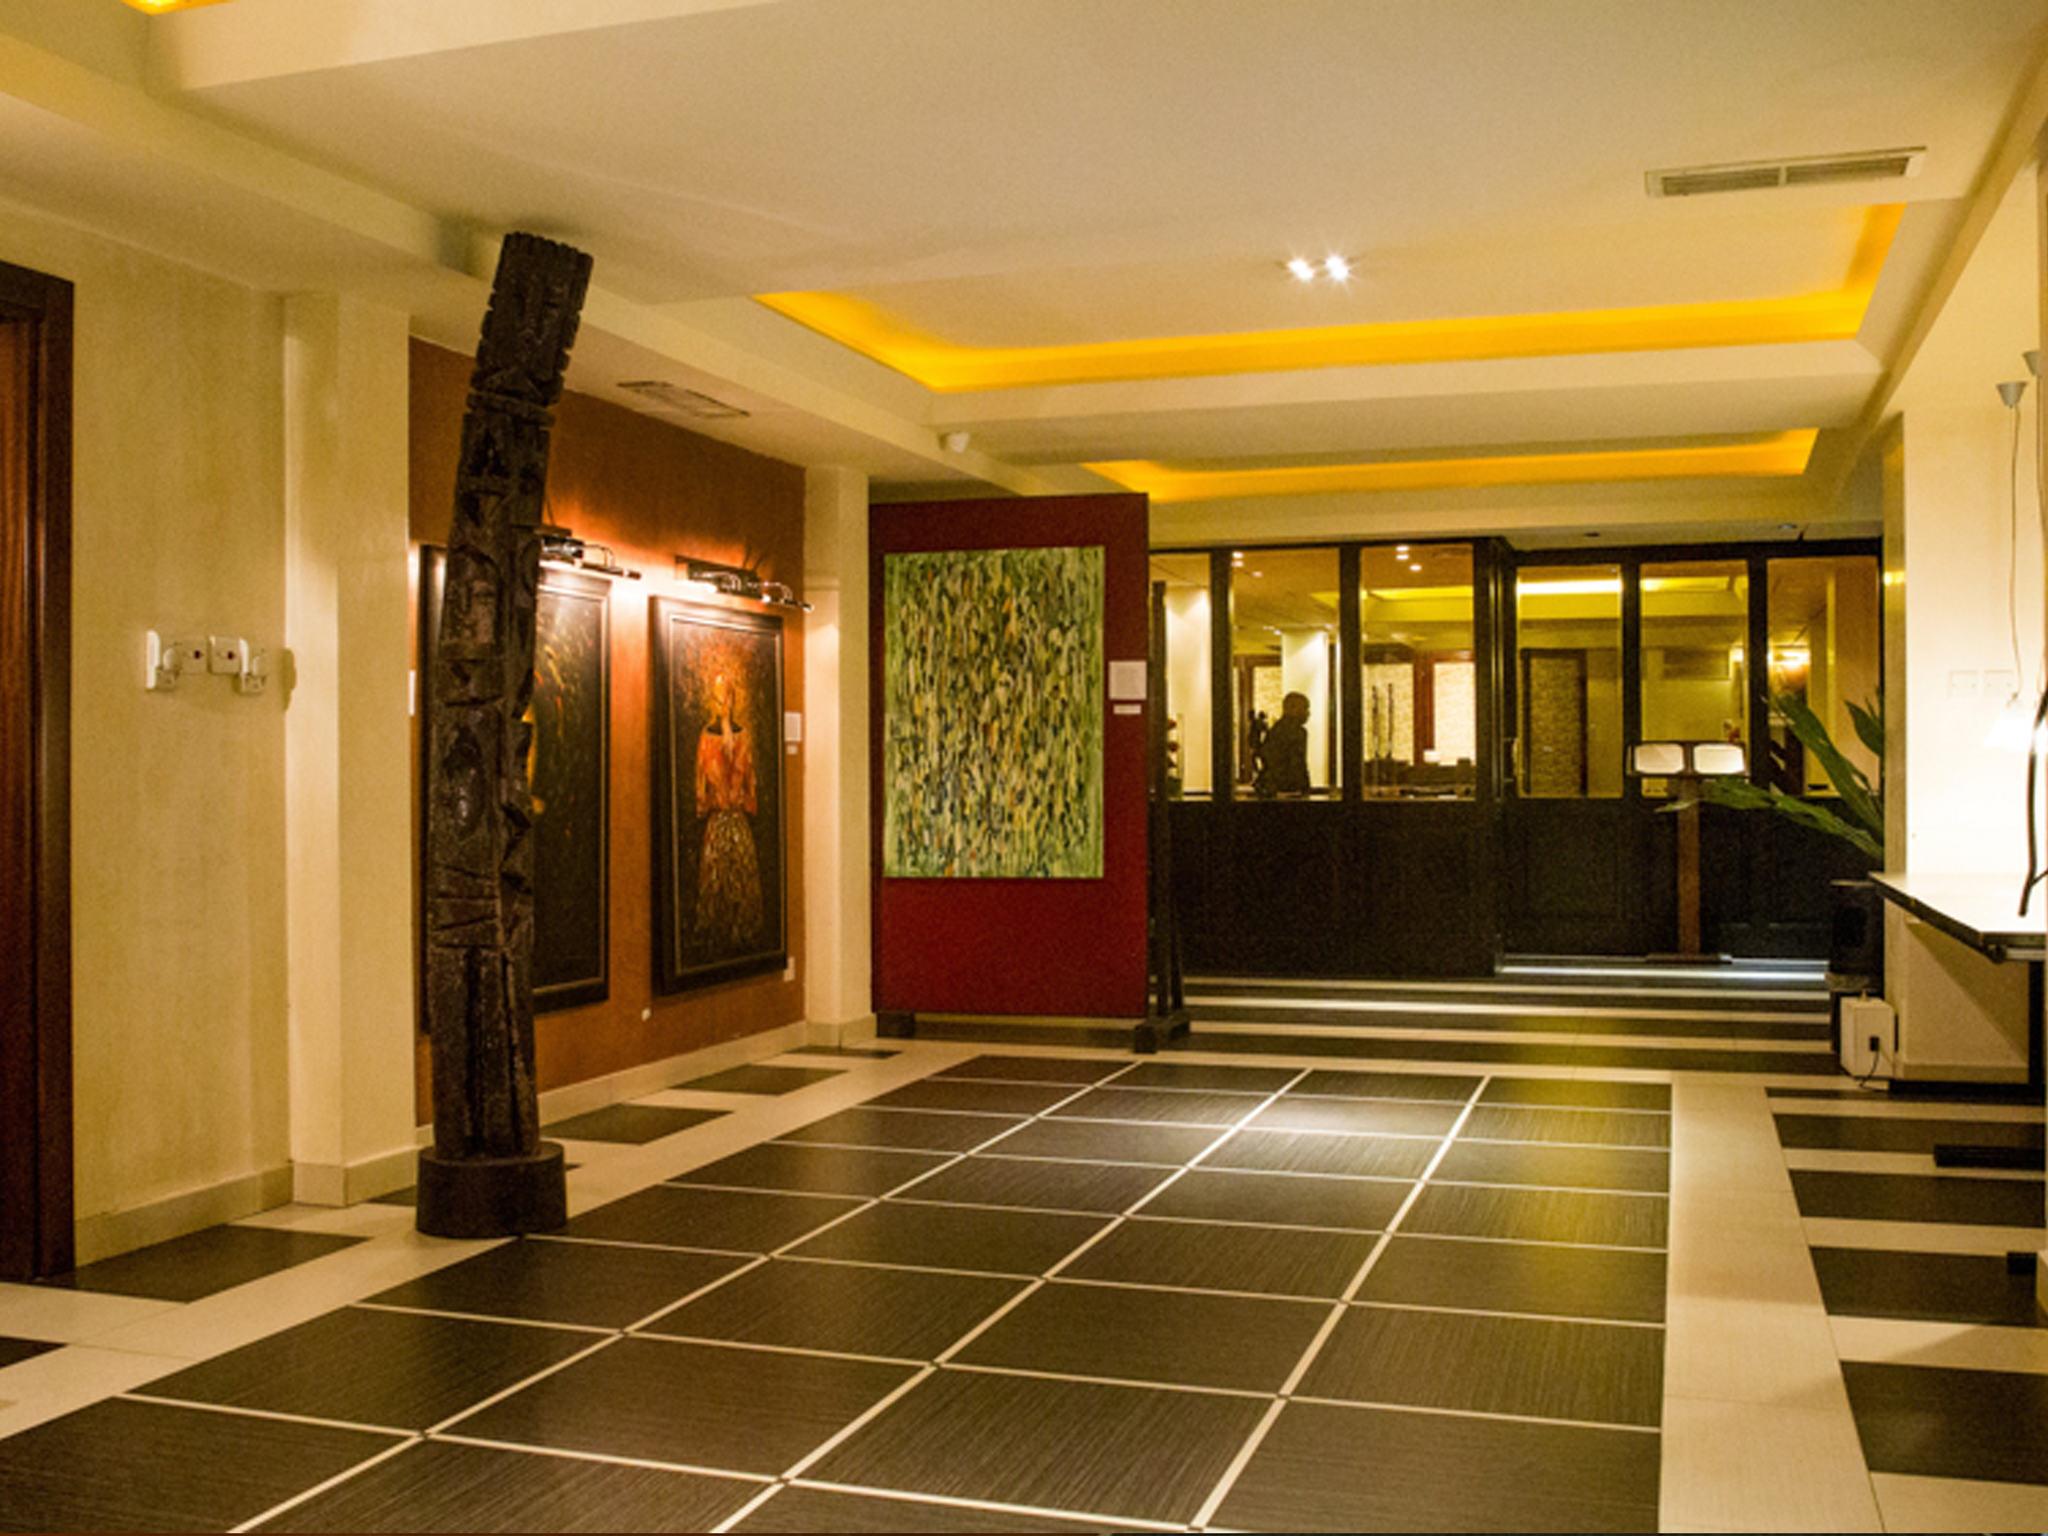 Hotel - Hotel Moorhouse Ikoyi Lagos - MGallery by Sofitel (Soon Mercure)